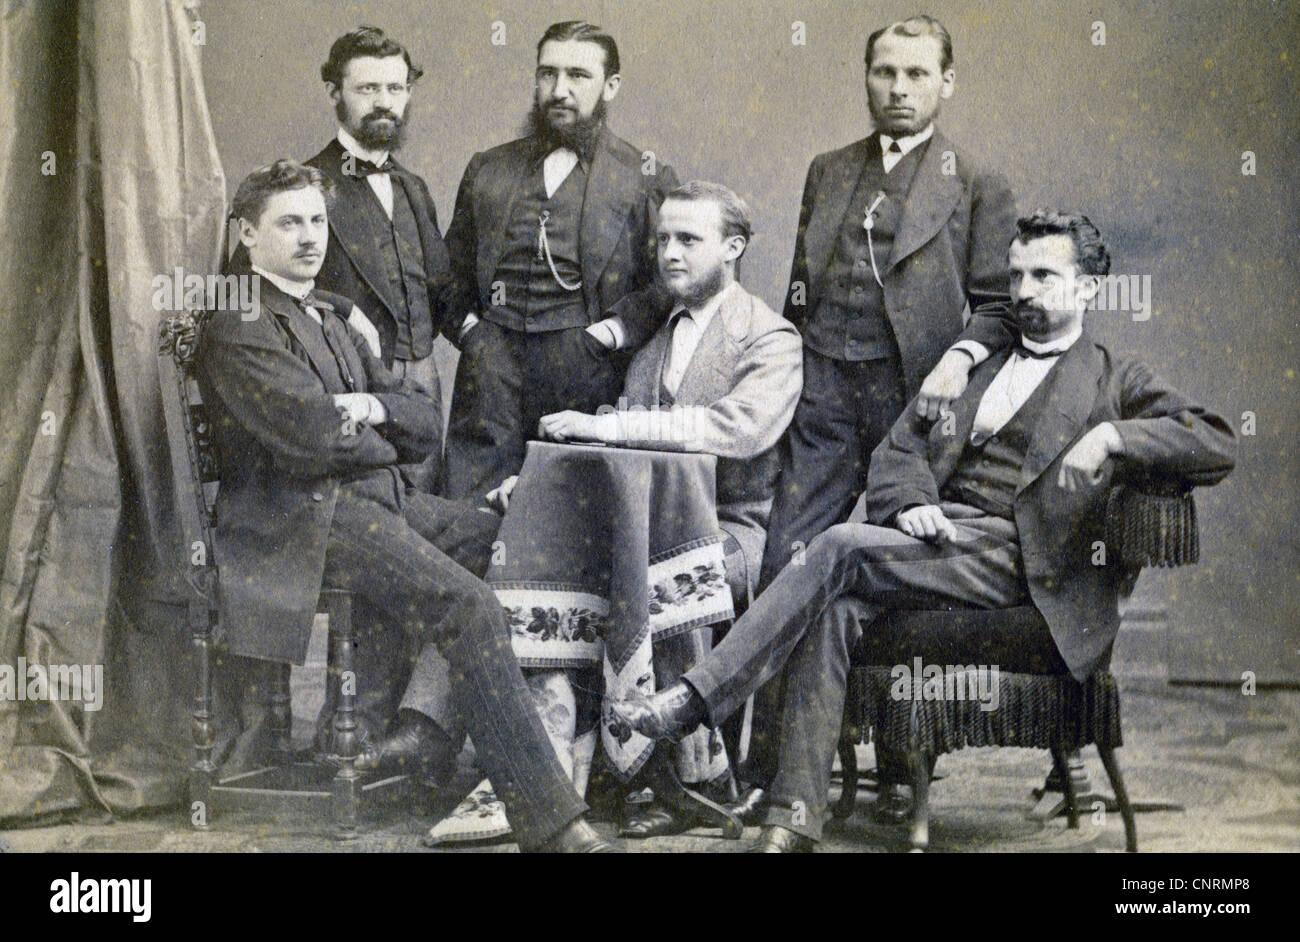 People Men Group Picture Late 19th Century Carte De Visite